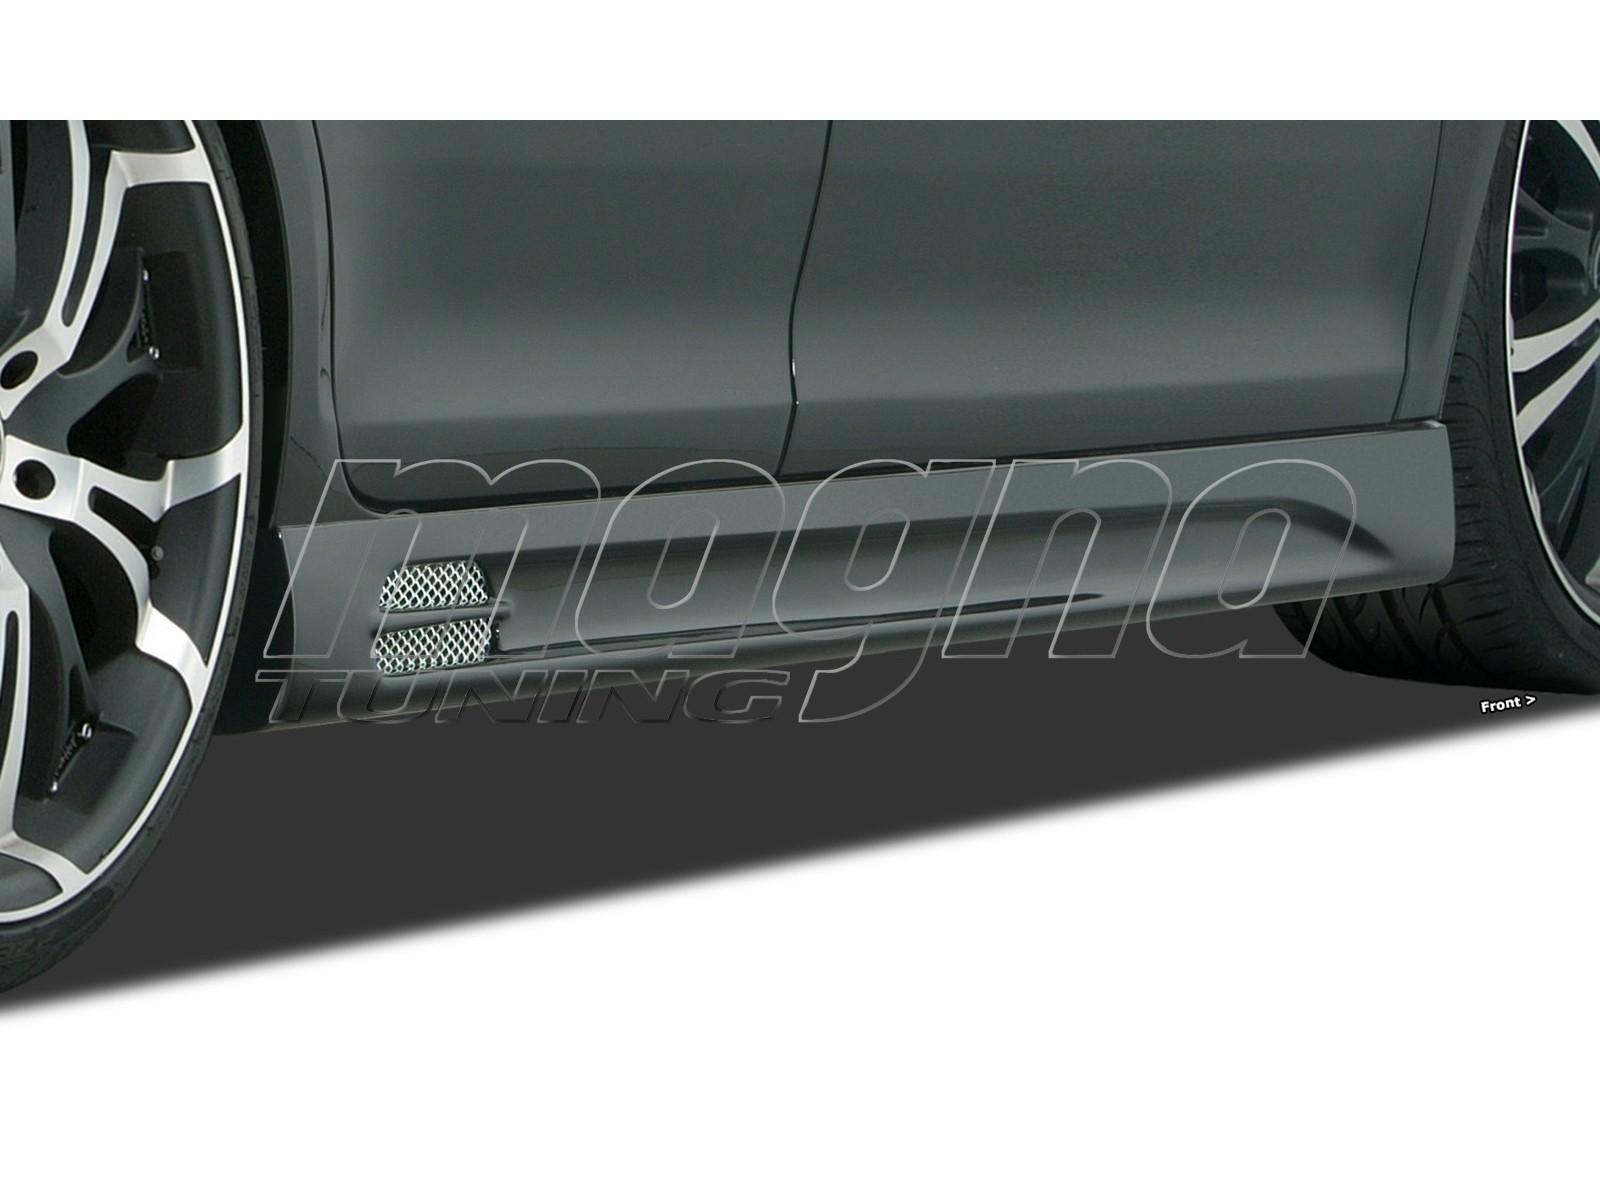 Volvo S60 MK3 GTX-Race Side Skirts